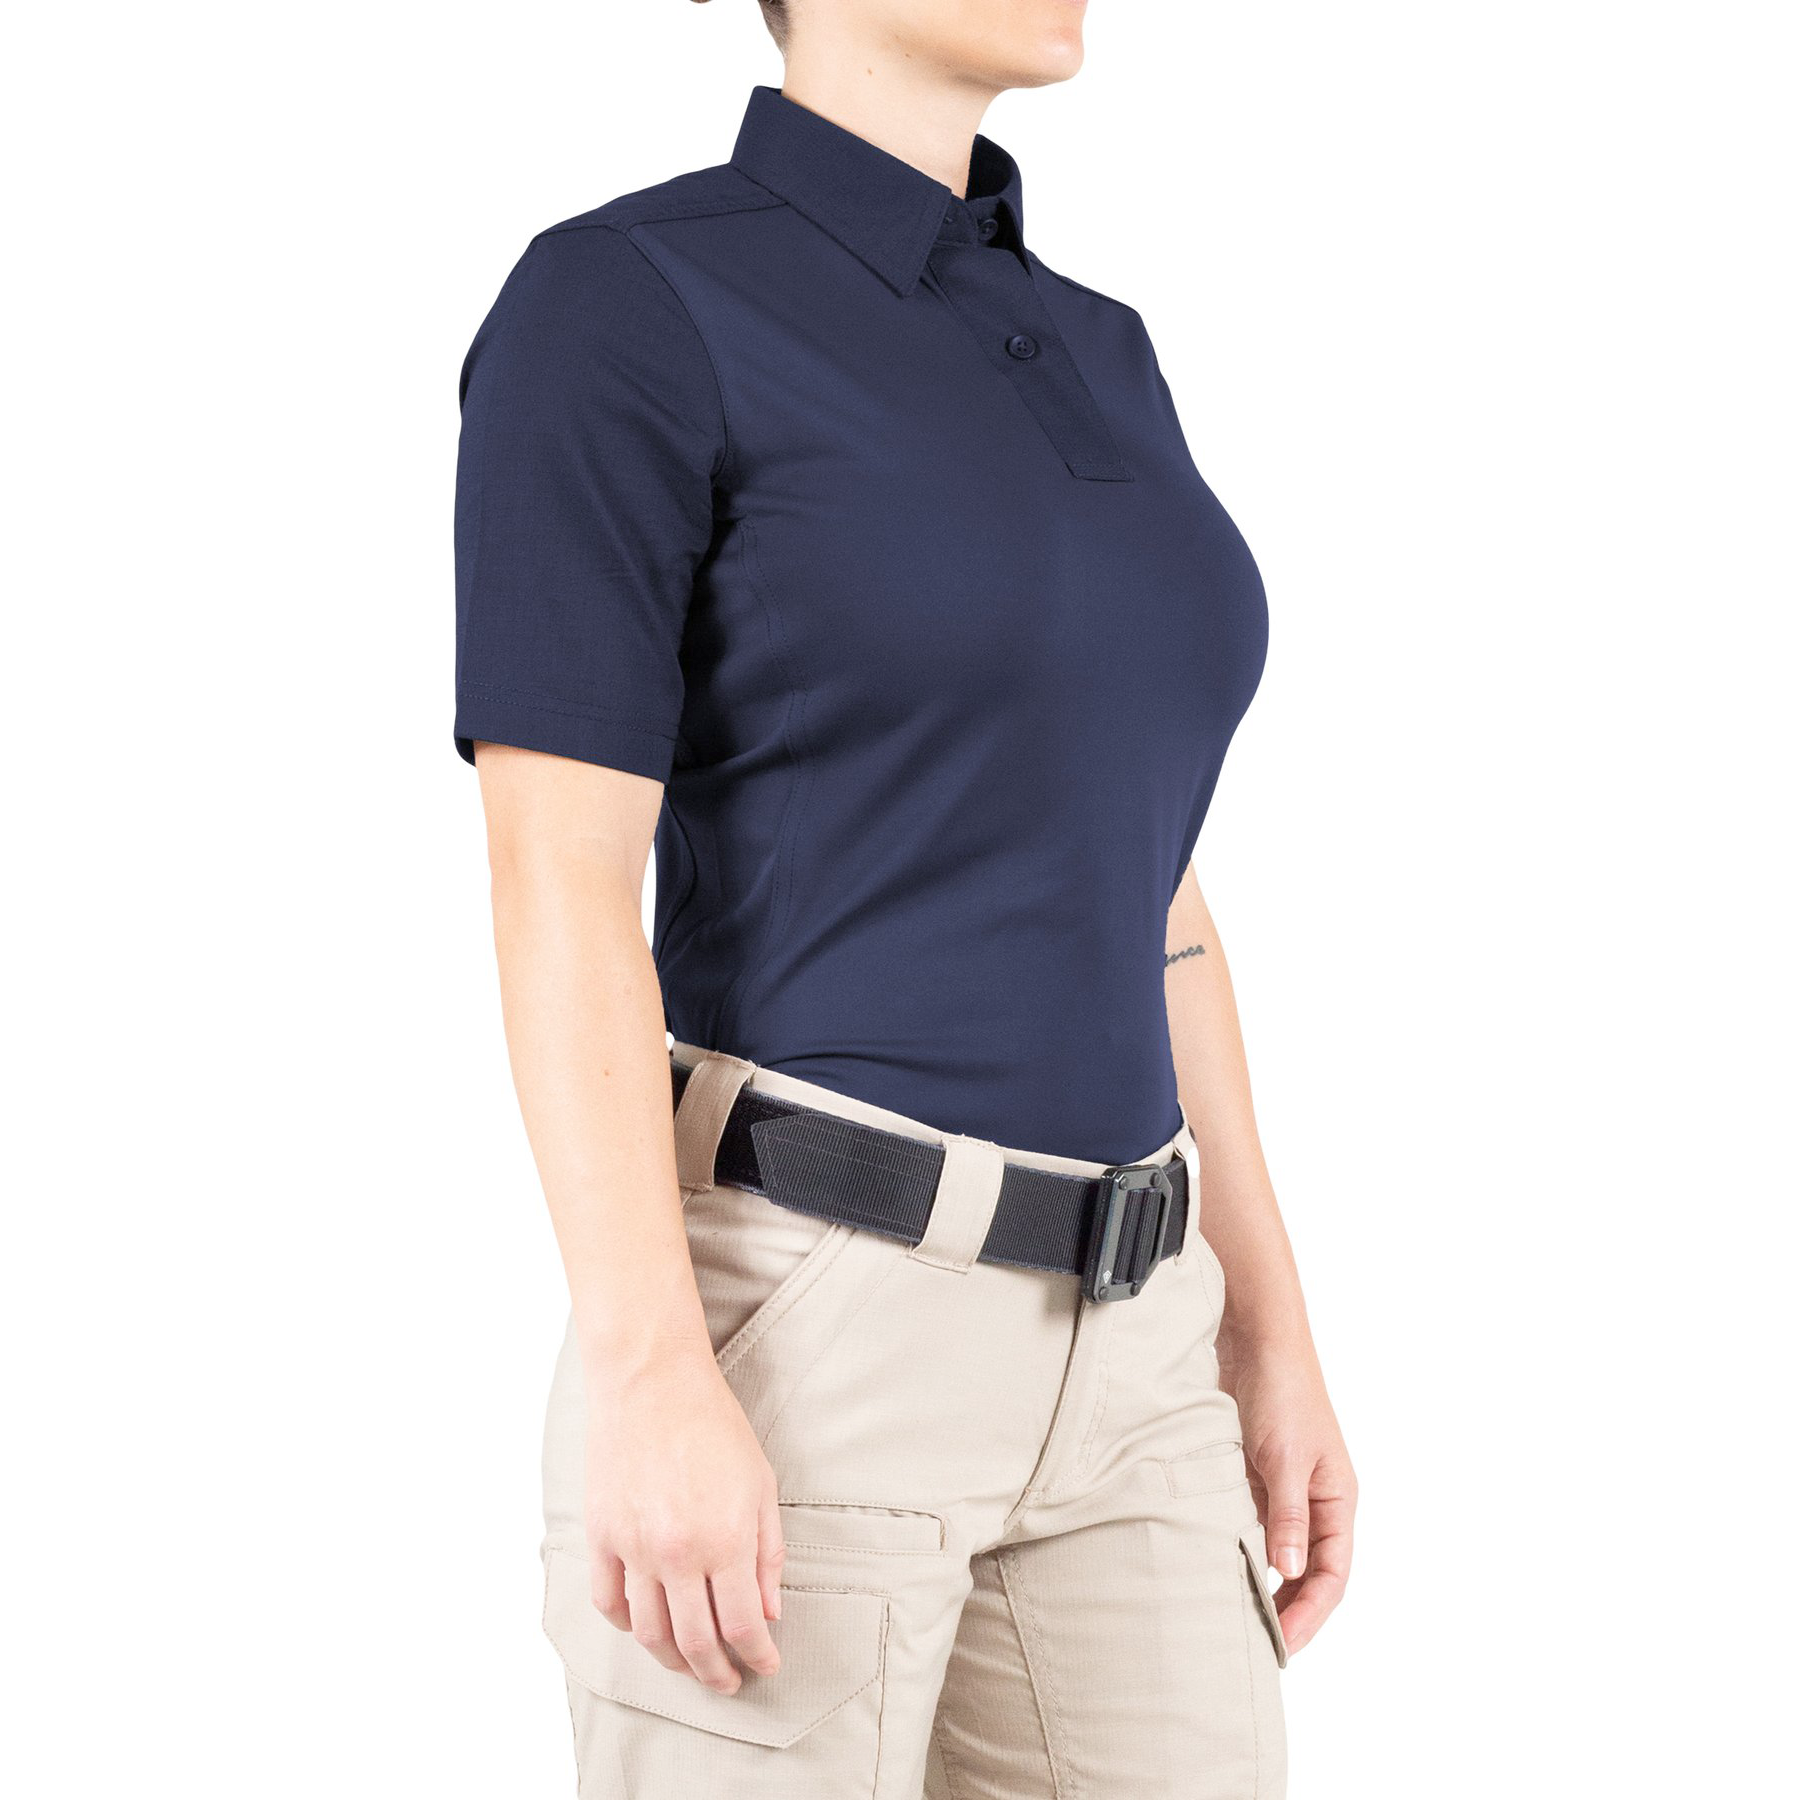 First Tactical Women's Short Sleeve V2 Pro Performance Shirt